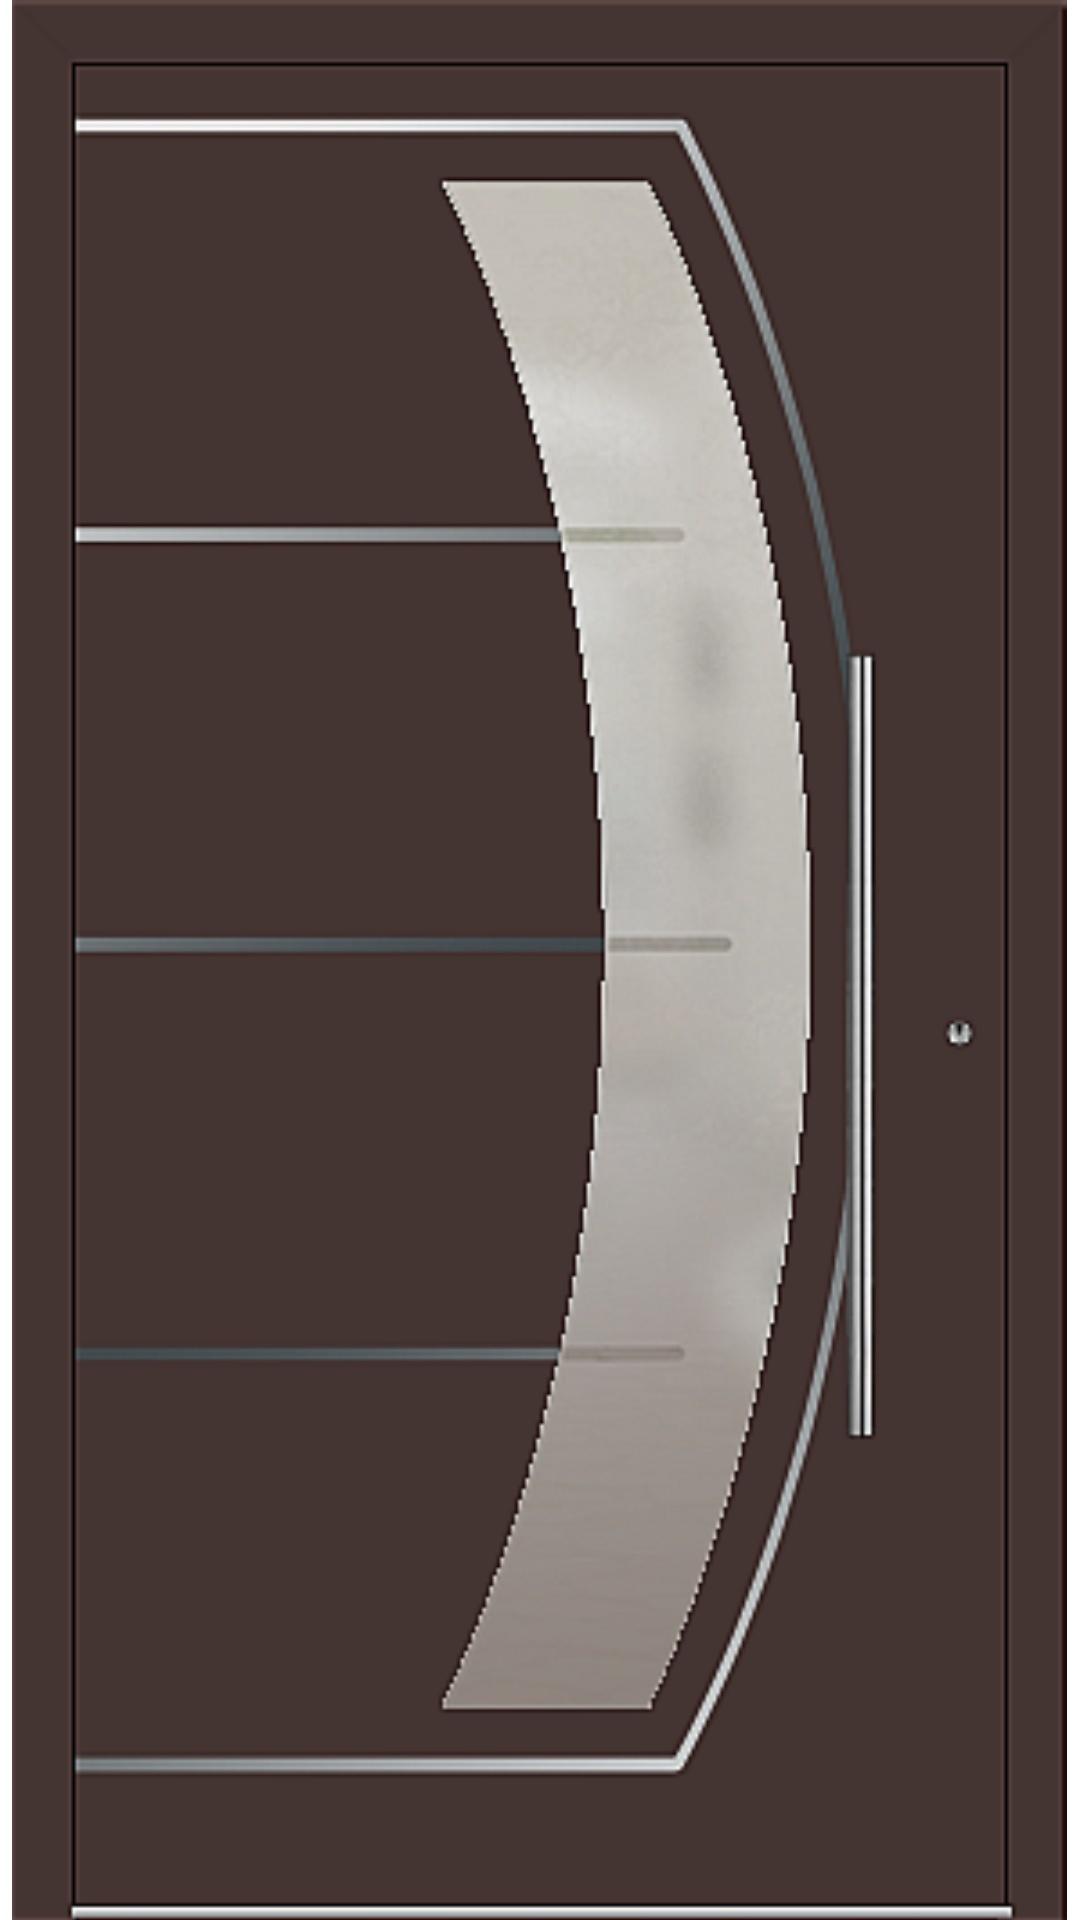 PaXentrée Aluminium Haustür M10201 mahagonibraun